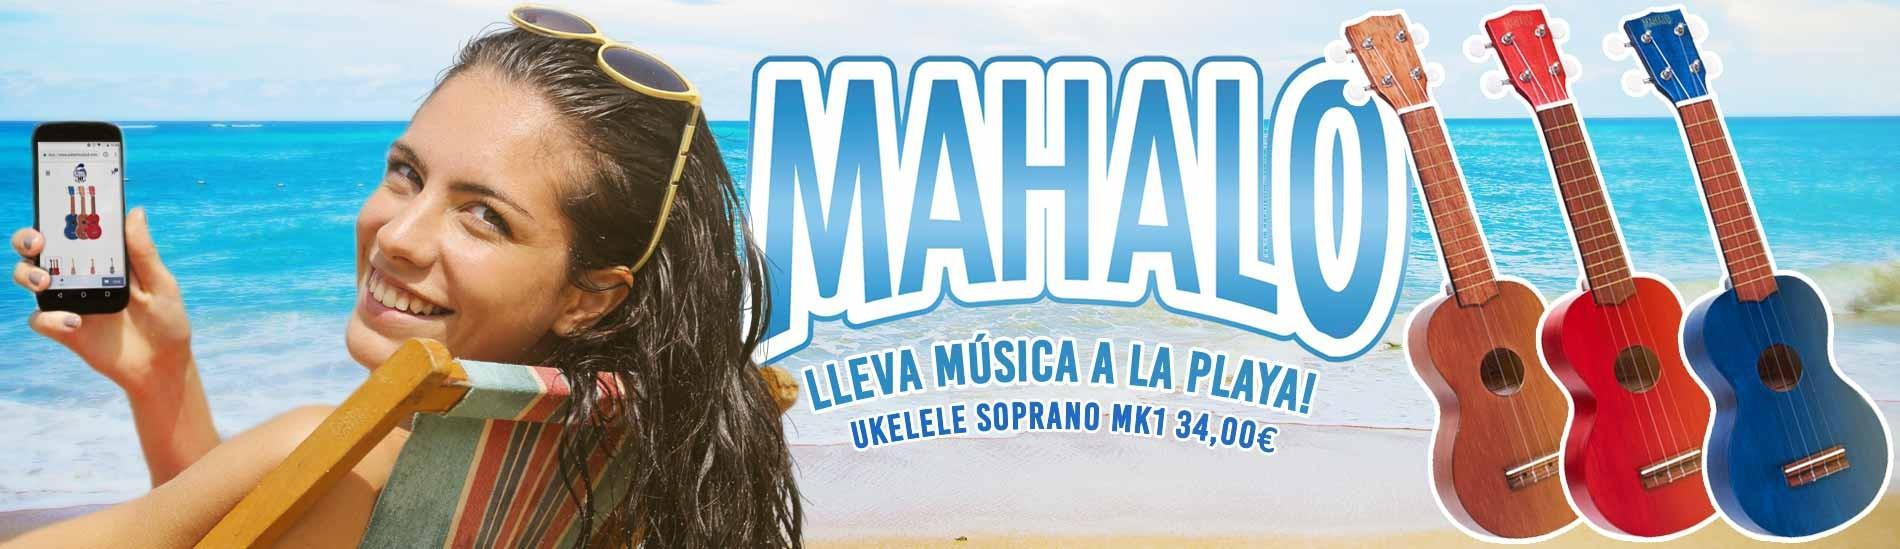 Ukelele Soprano Mahalo MK1 - Lleva música a la playa!